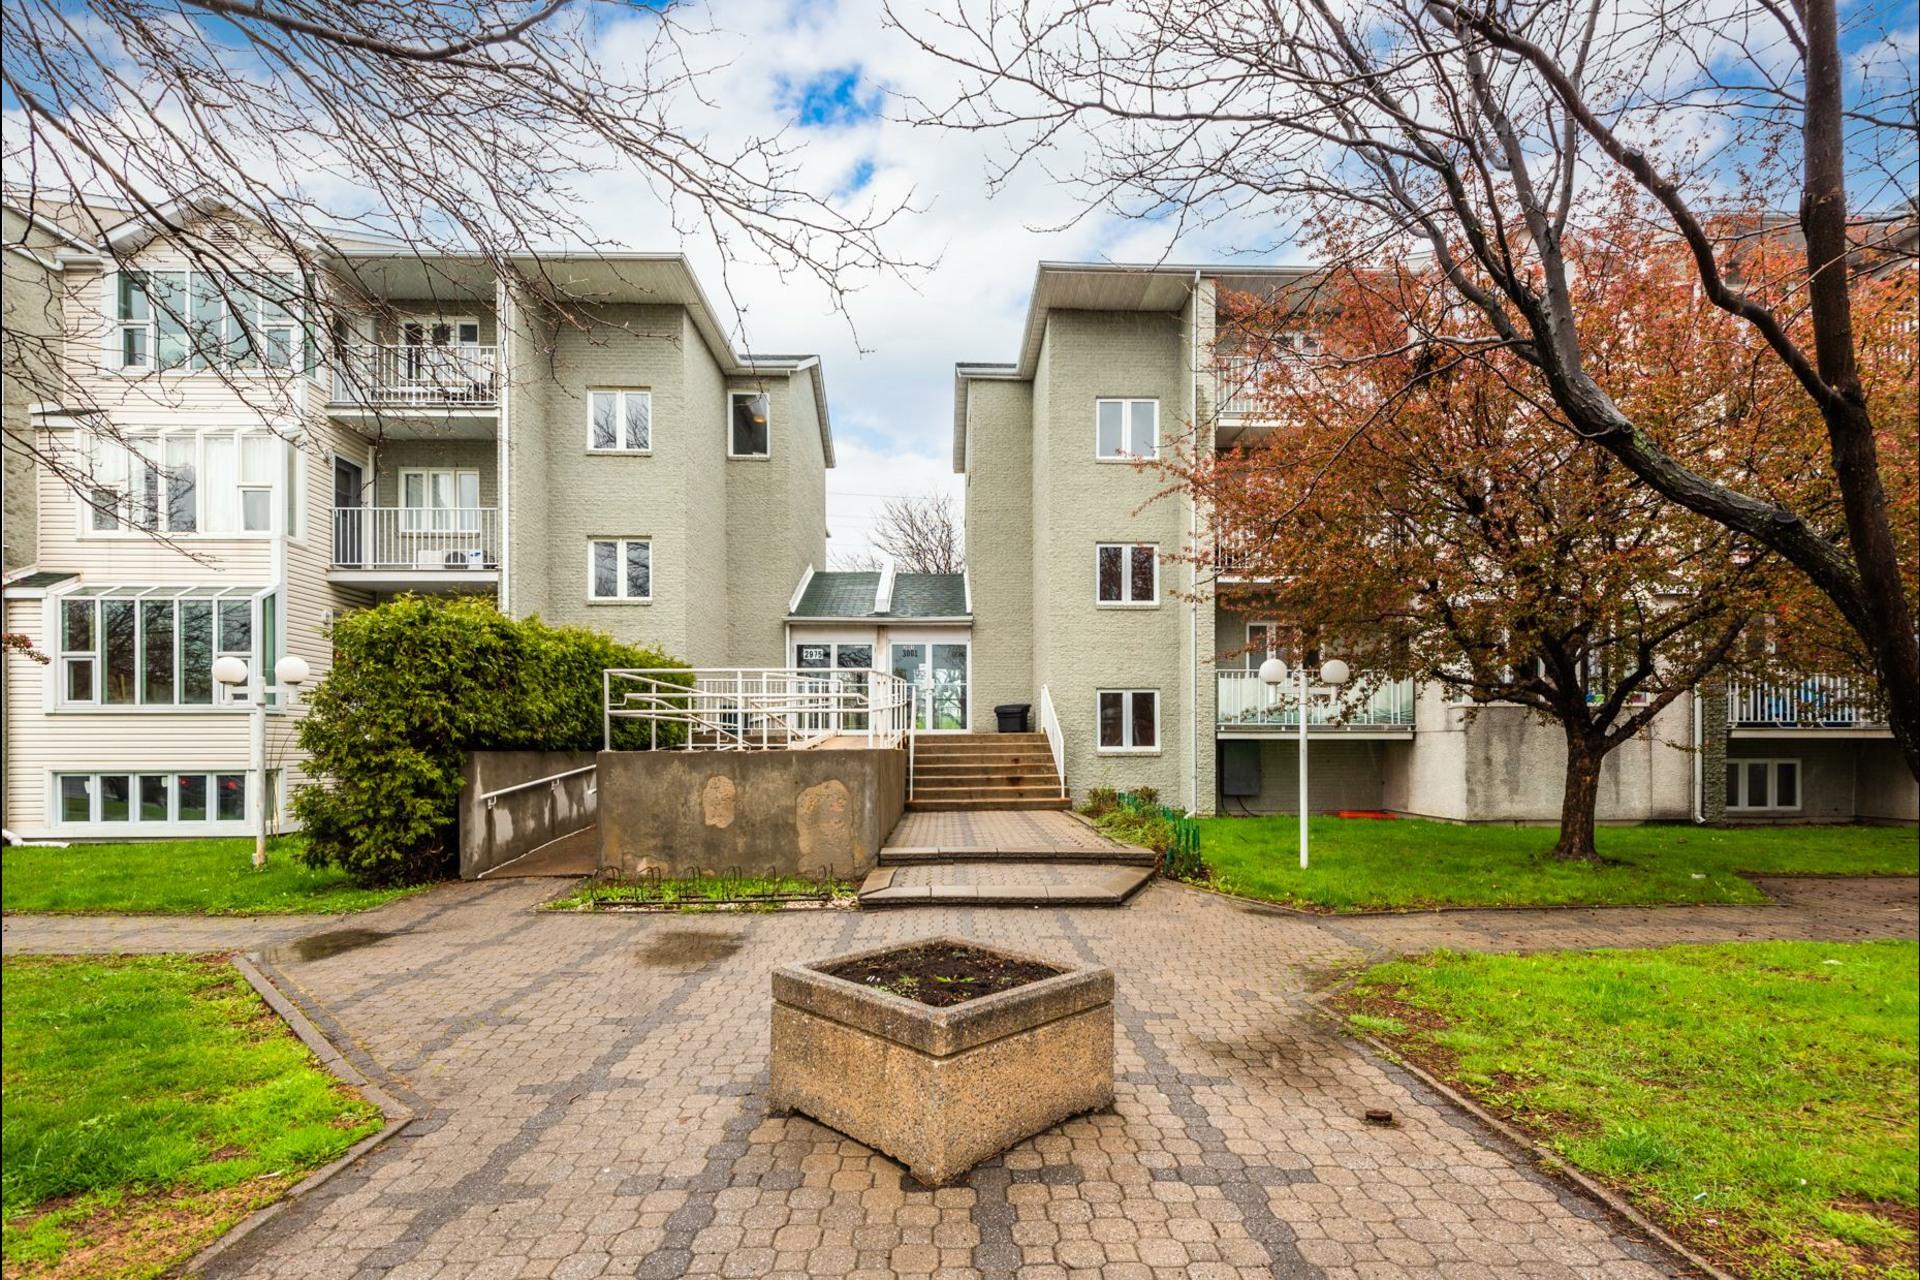 image 4 - Apartment For sale Saint-Hubert Longueuil  - 4 rooms